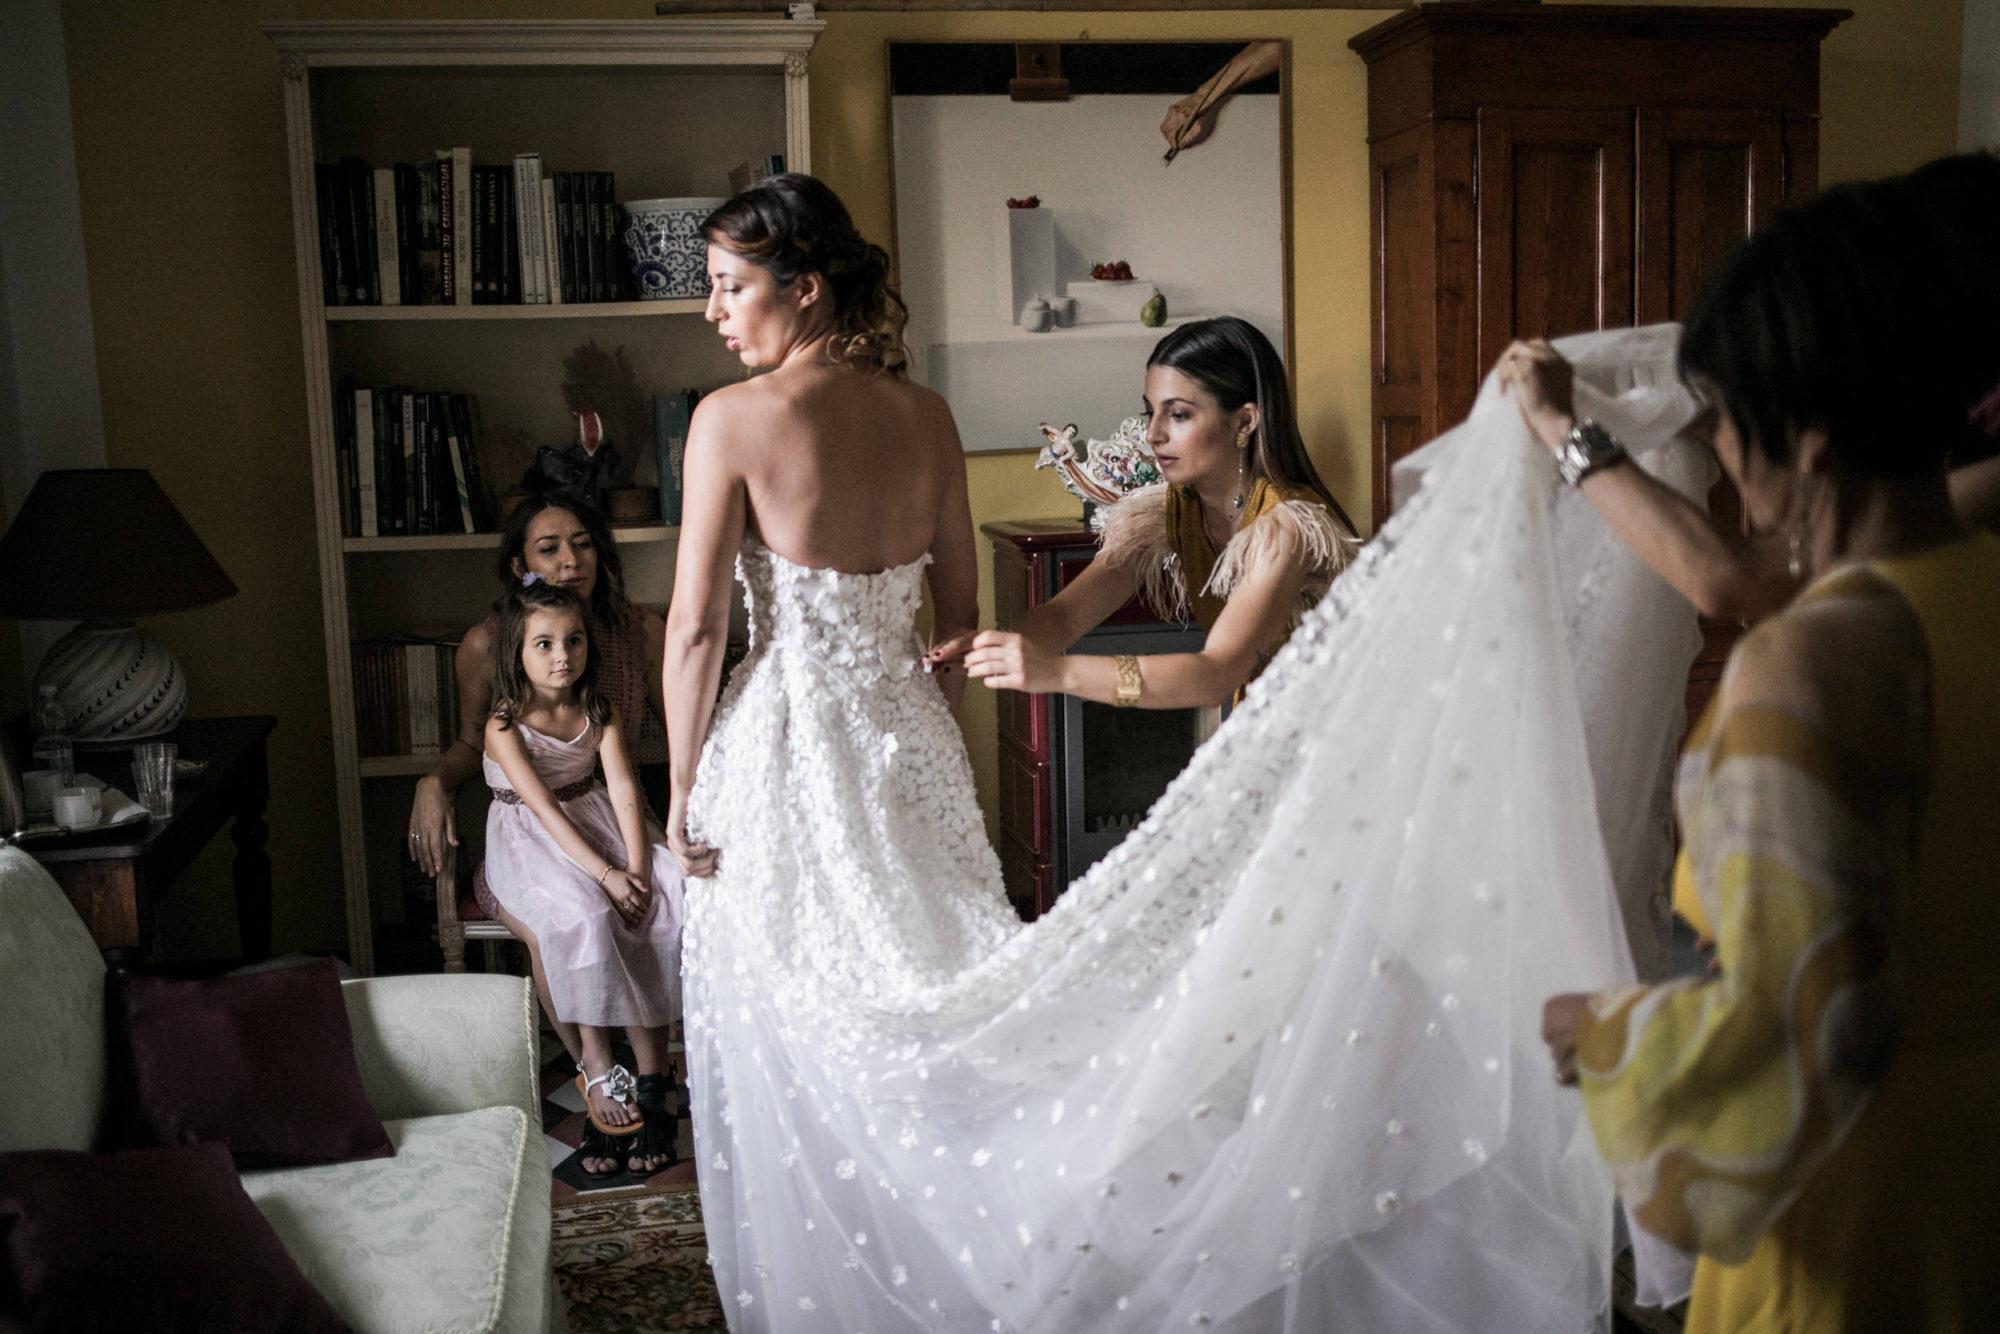 matrimonio_villa-ferrari-gussola_MI-015